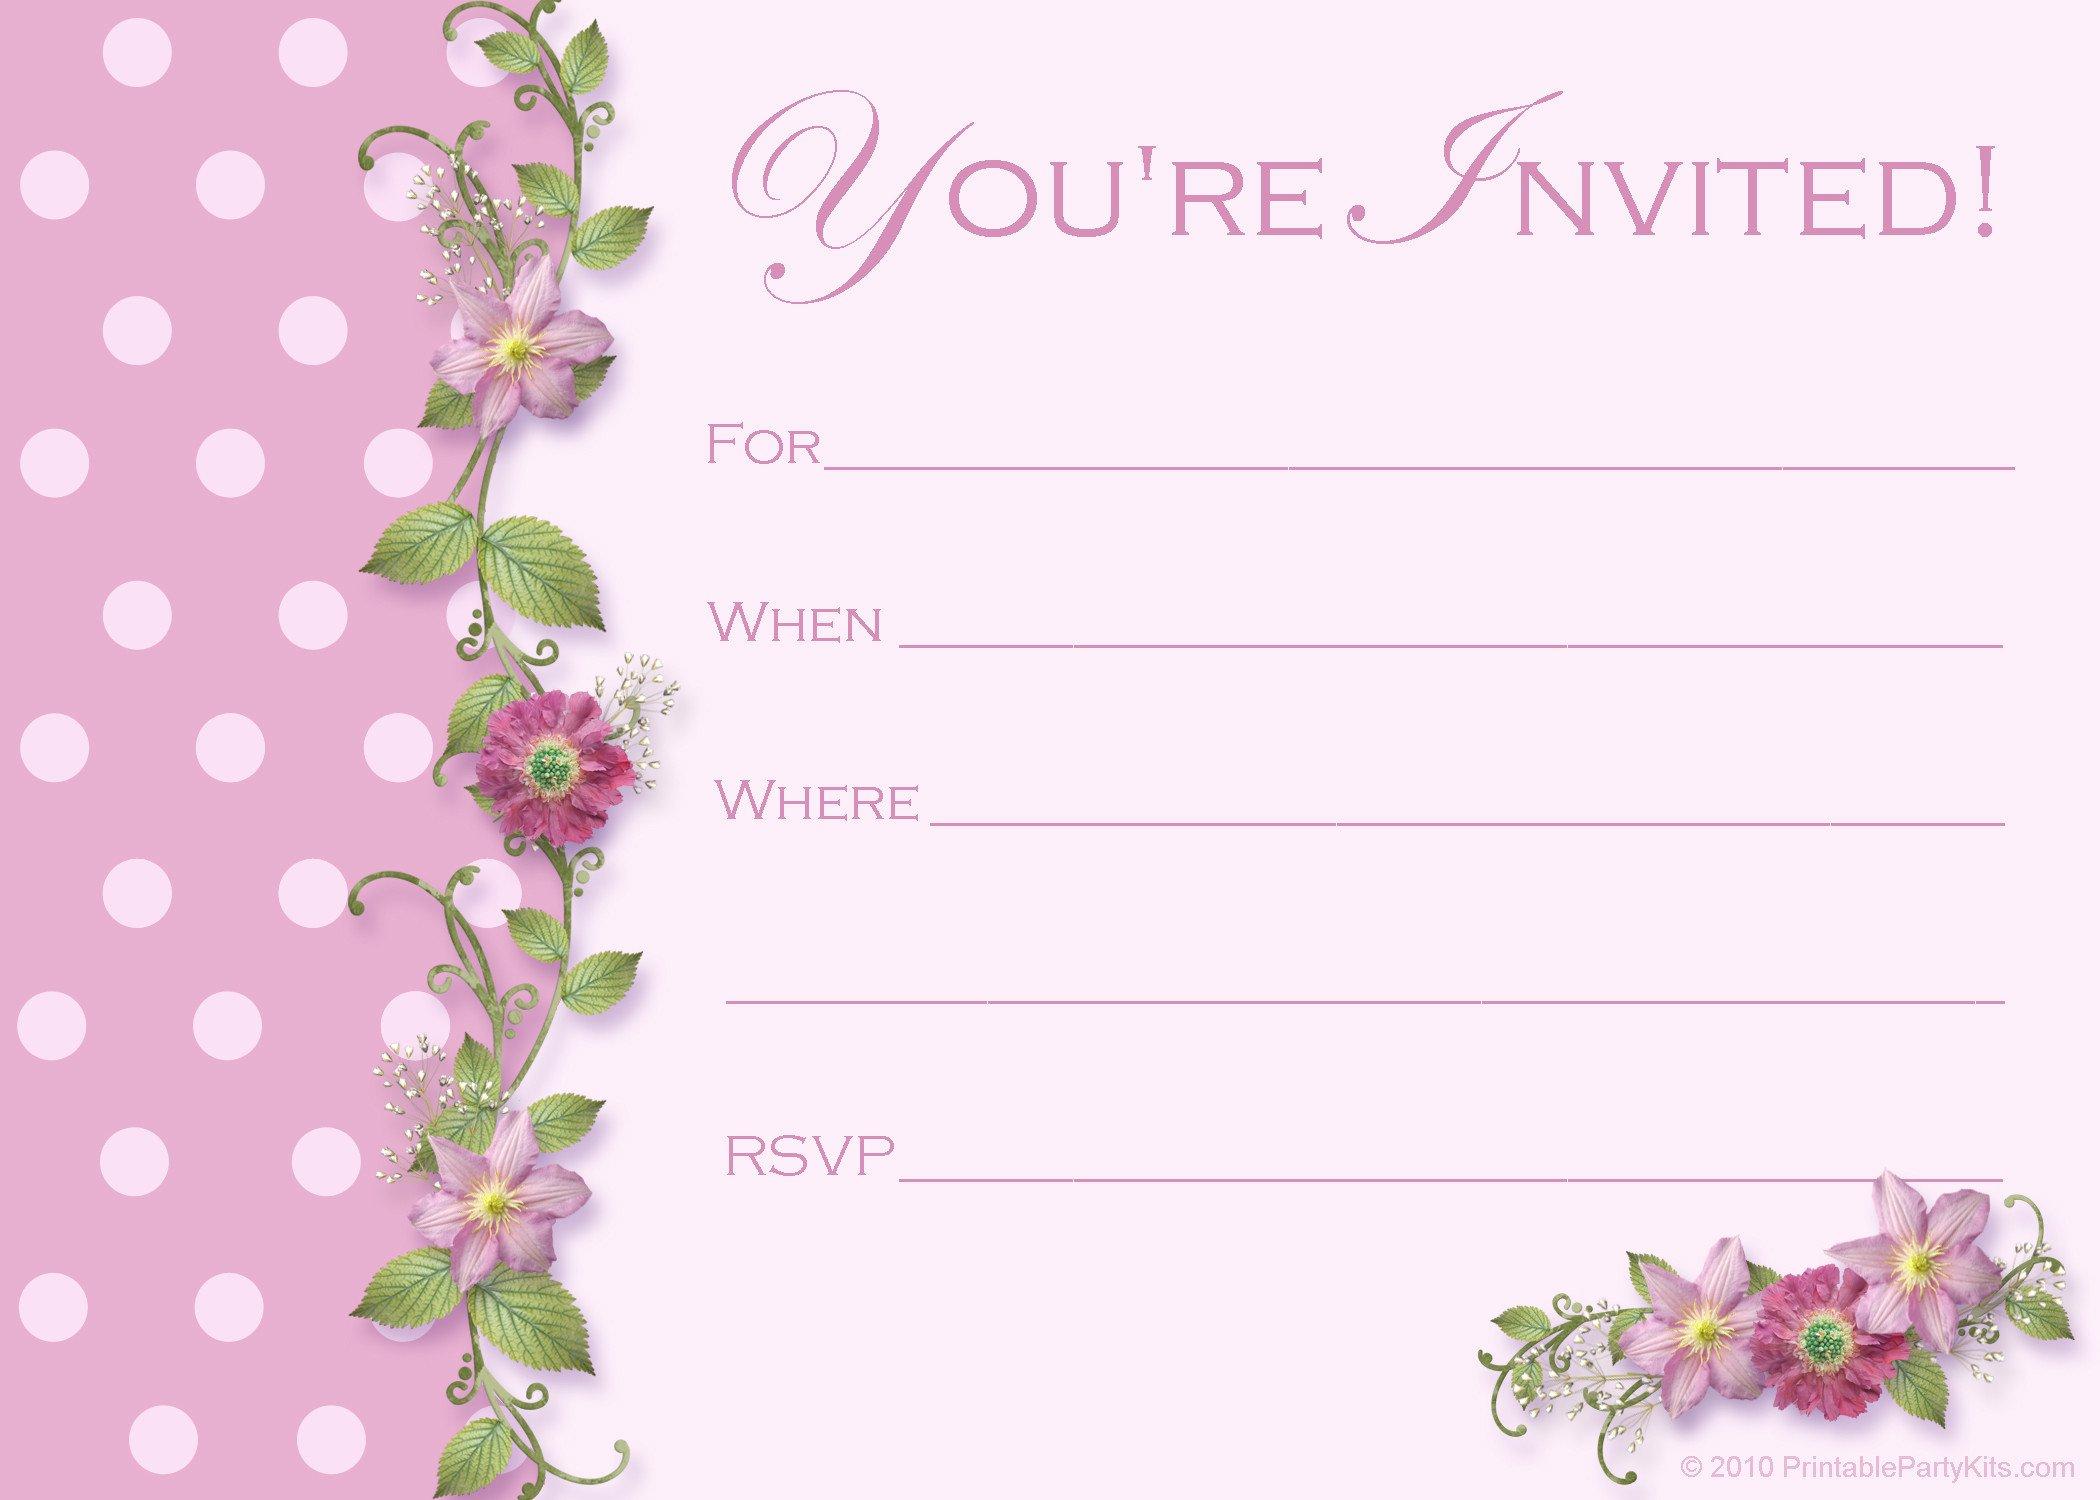 Free Printable Invitation Templates Free Sweet 16 Birthday Invitations – Free Printable